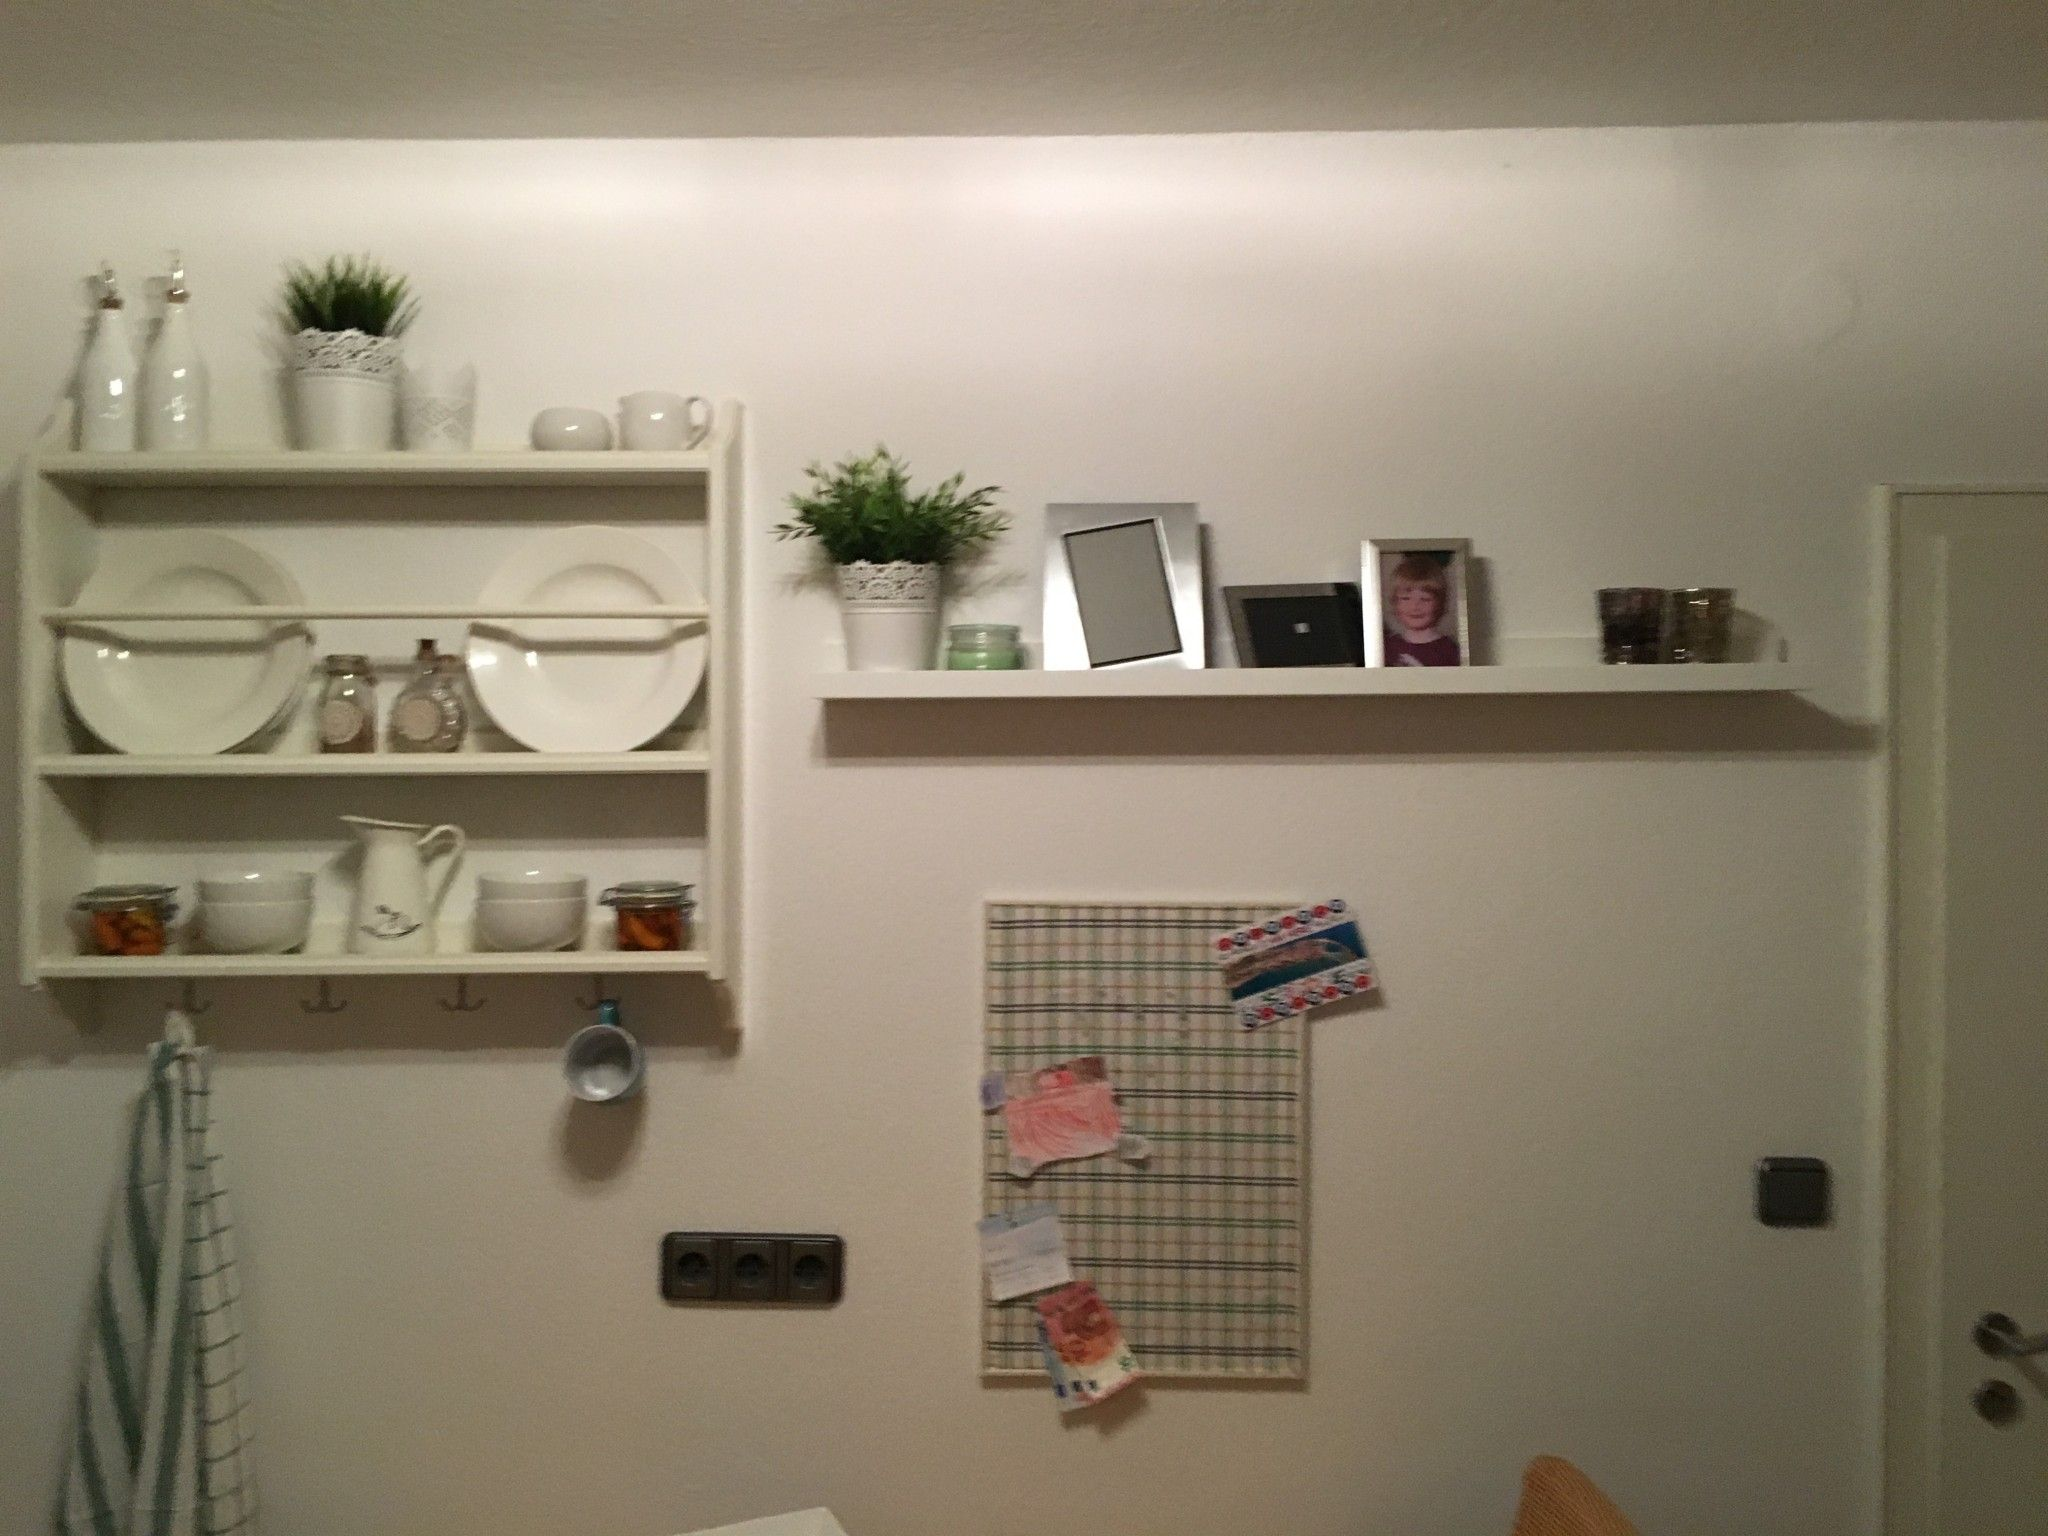 IKEA Pinnwand mit Stoff beziehen